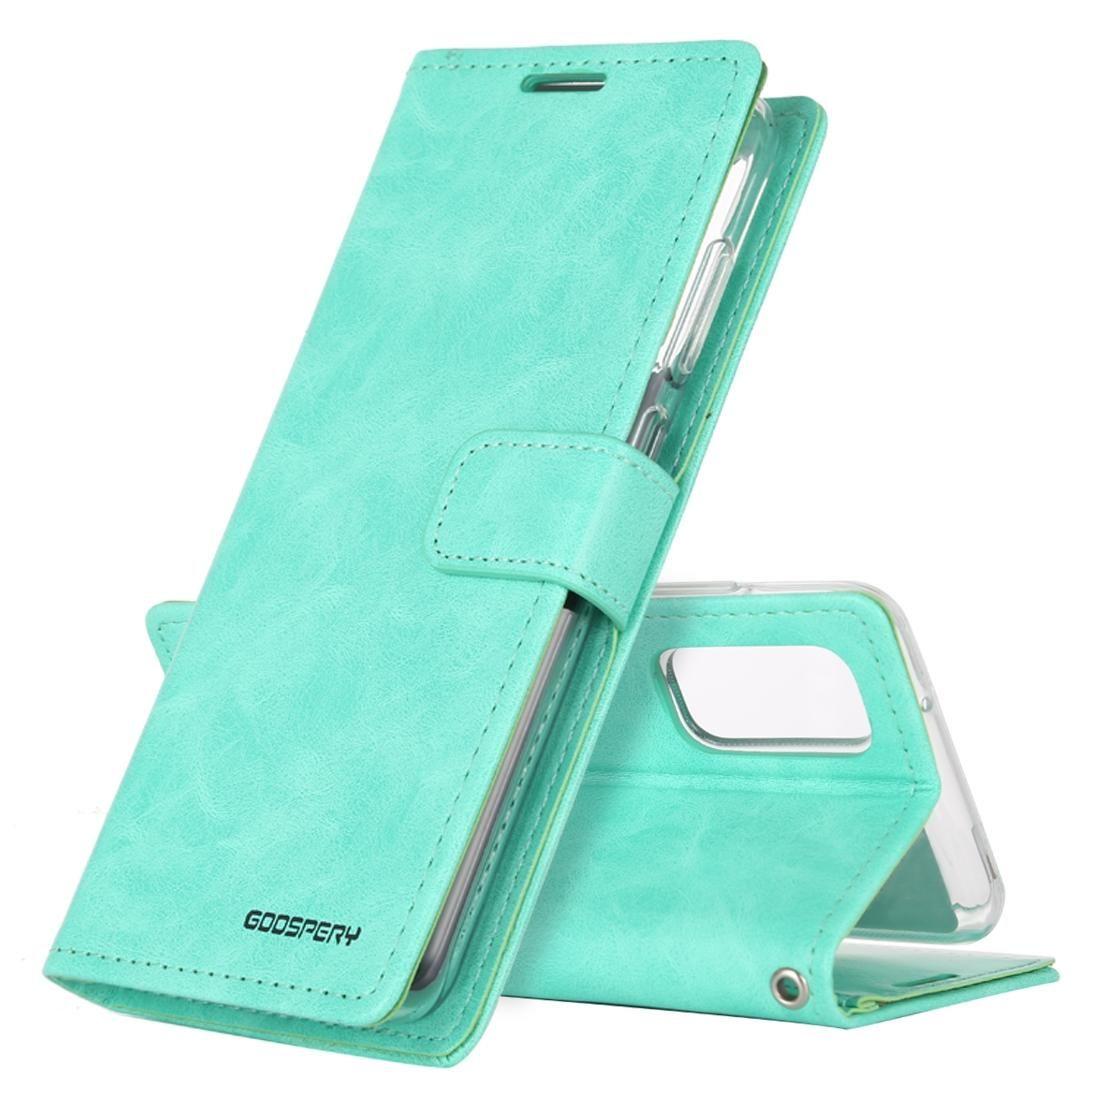 Für Galaxy S20 Plus-GOOSPERY BLUE MOON DIARY Crazy Horse Textur Horizontal Flip Ledertasche mit Halter-Karten-Slot Wallet